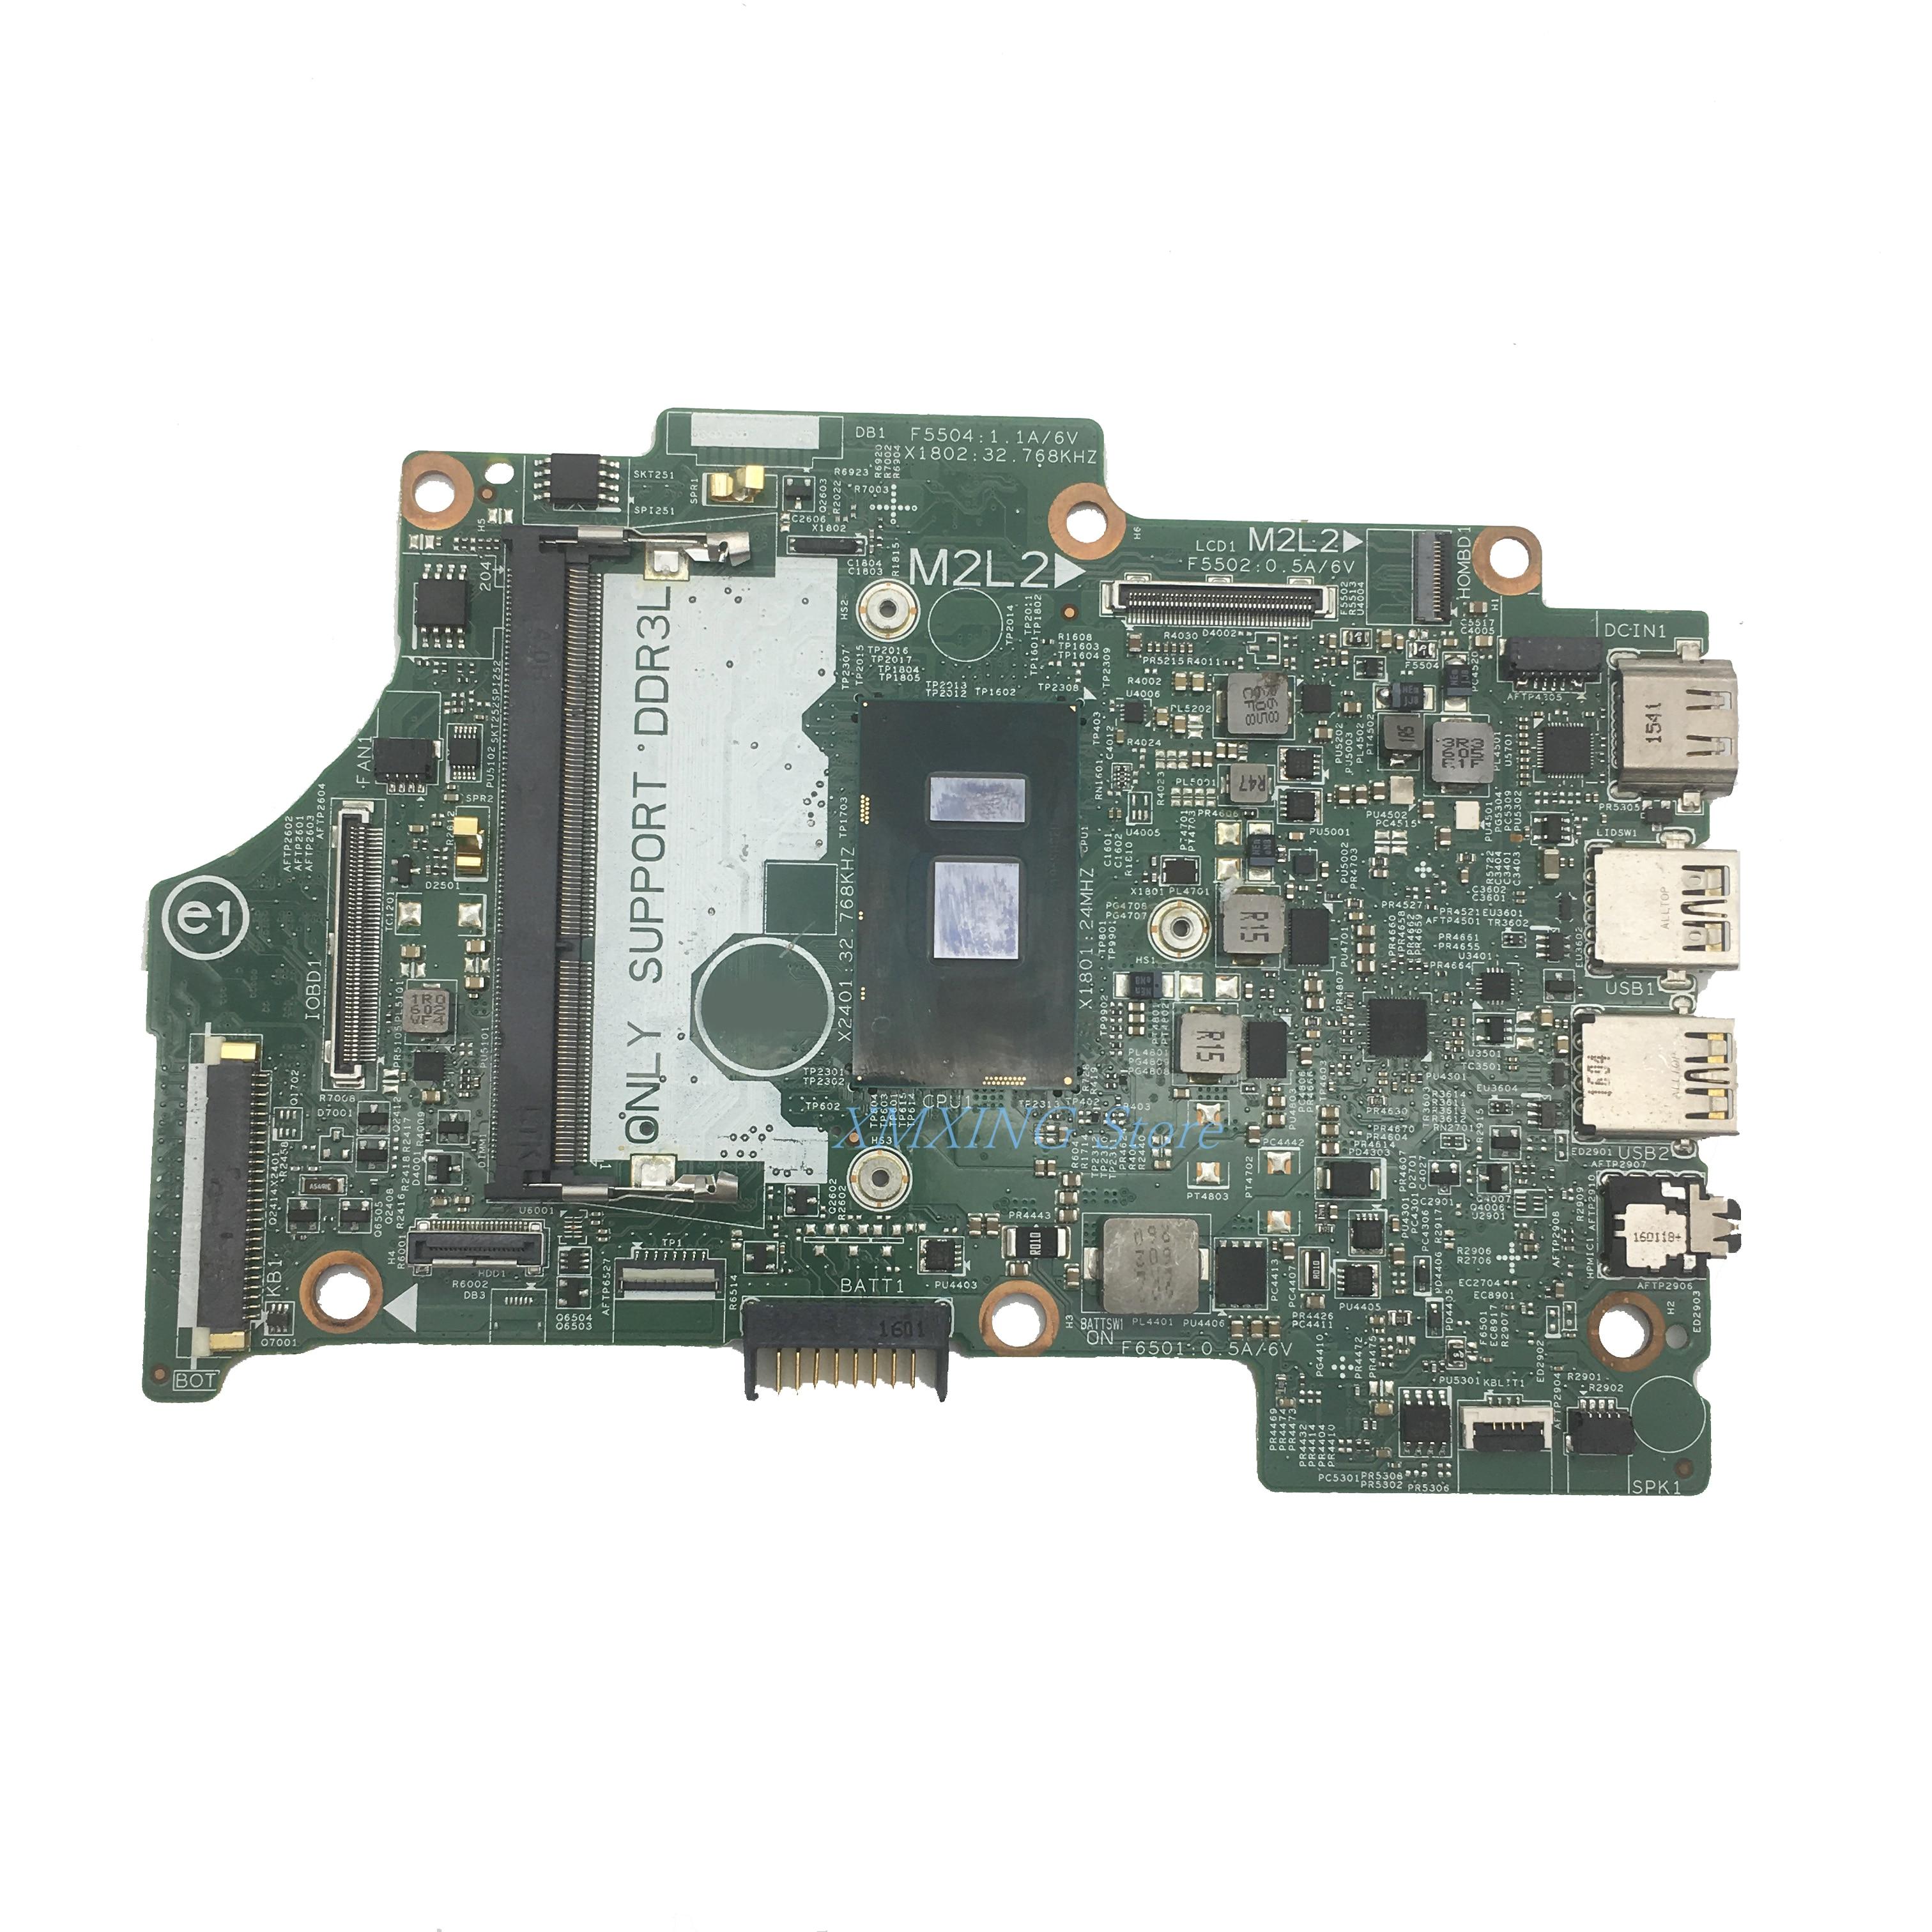 SR2EU I3-6100U FULCOL Para DELL Latitude 7359 7349 Laptop Motherboard CPU 14296-1 CN-0KN06J CN-004R70 0KN06J Testado 100% de trabalho